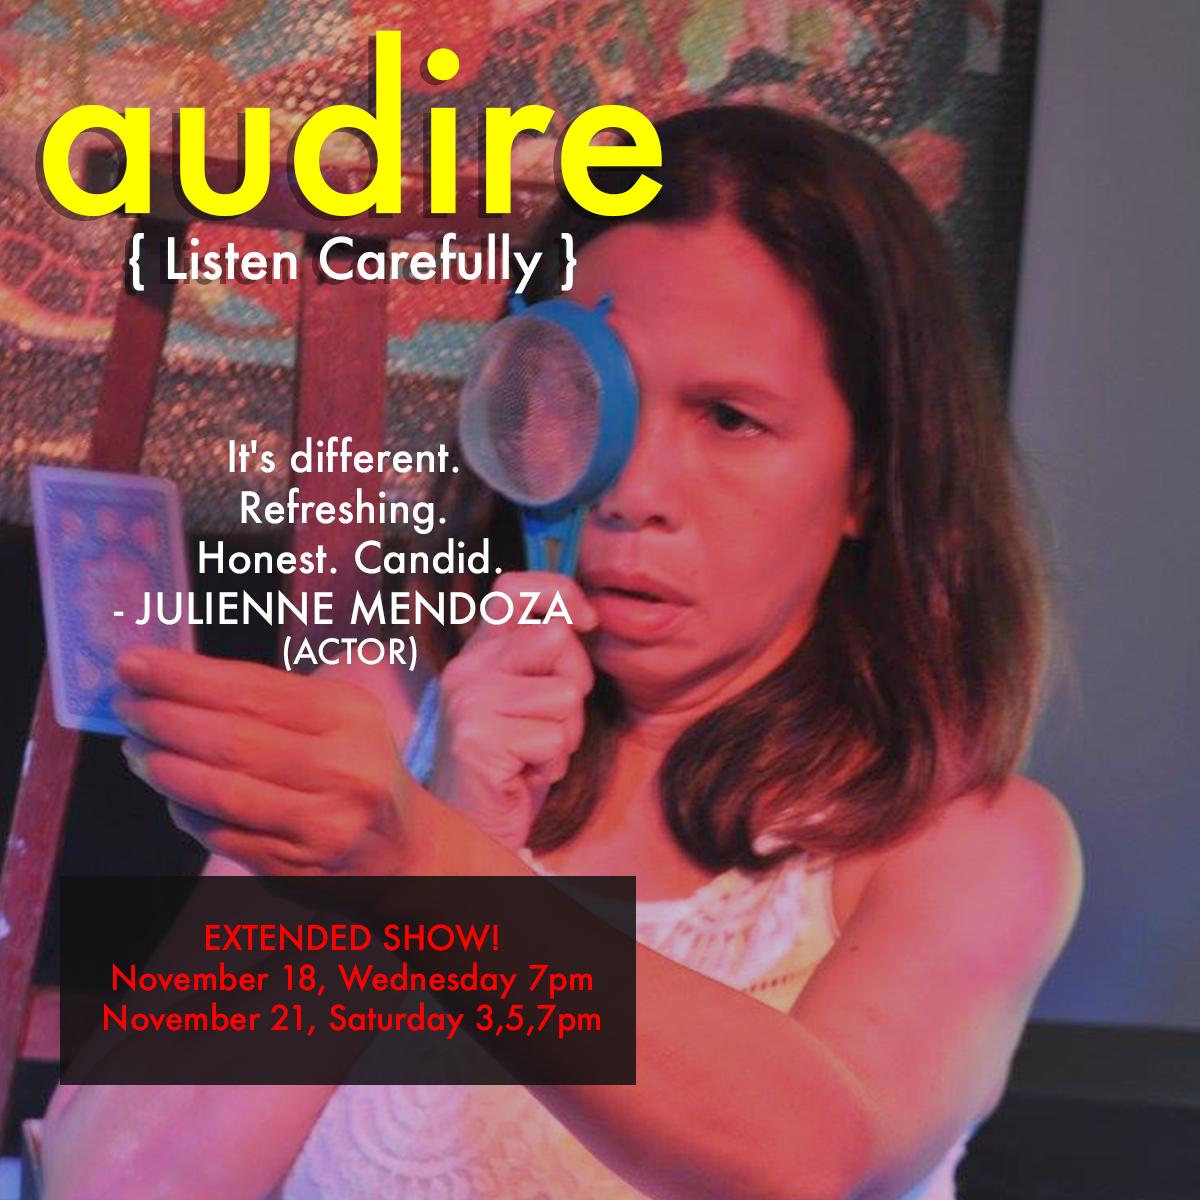 audire-reviews1.png